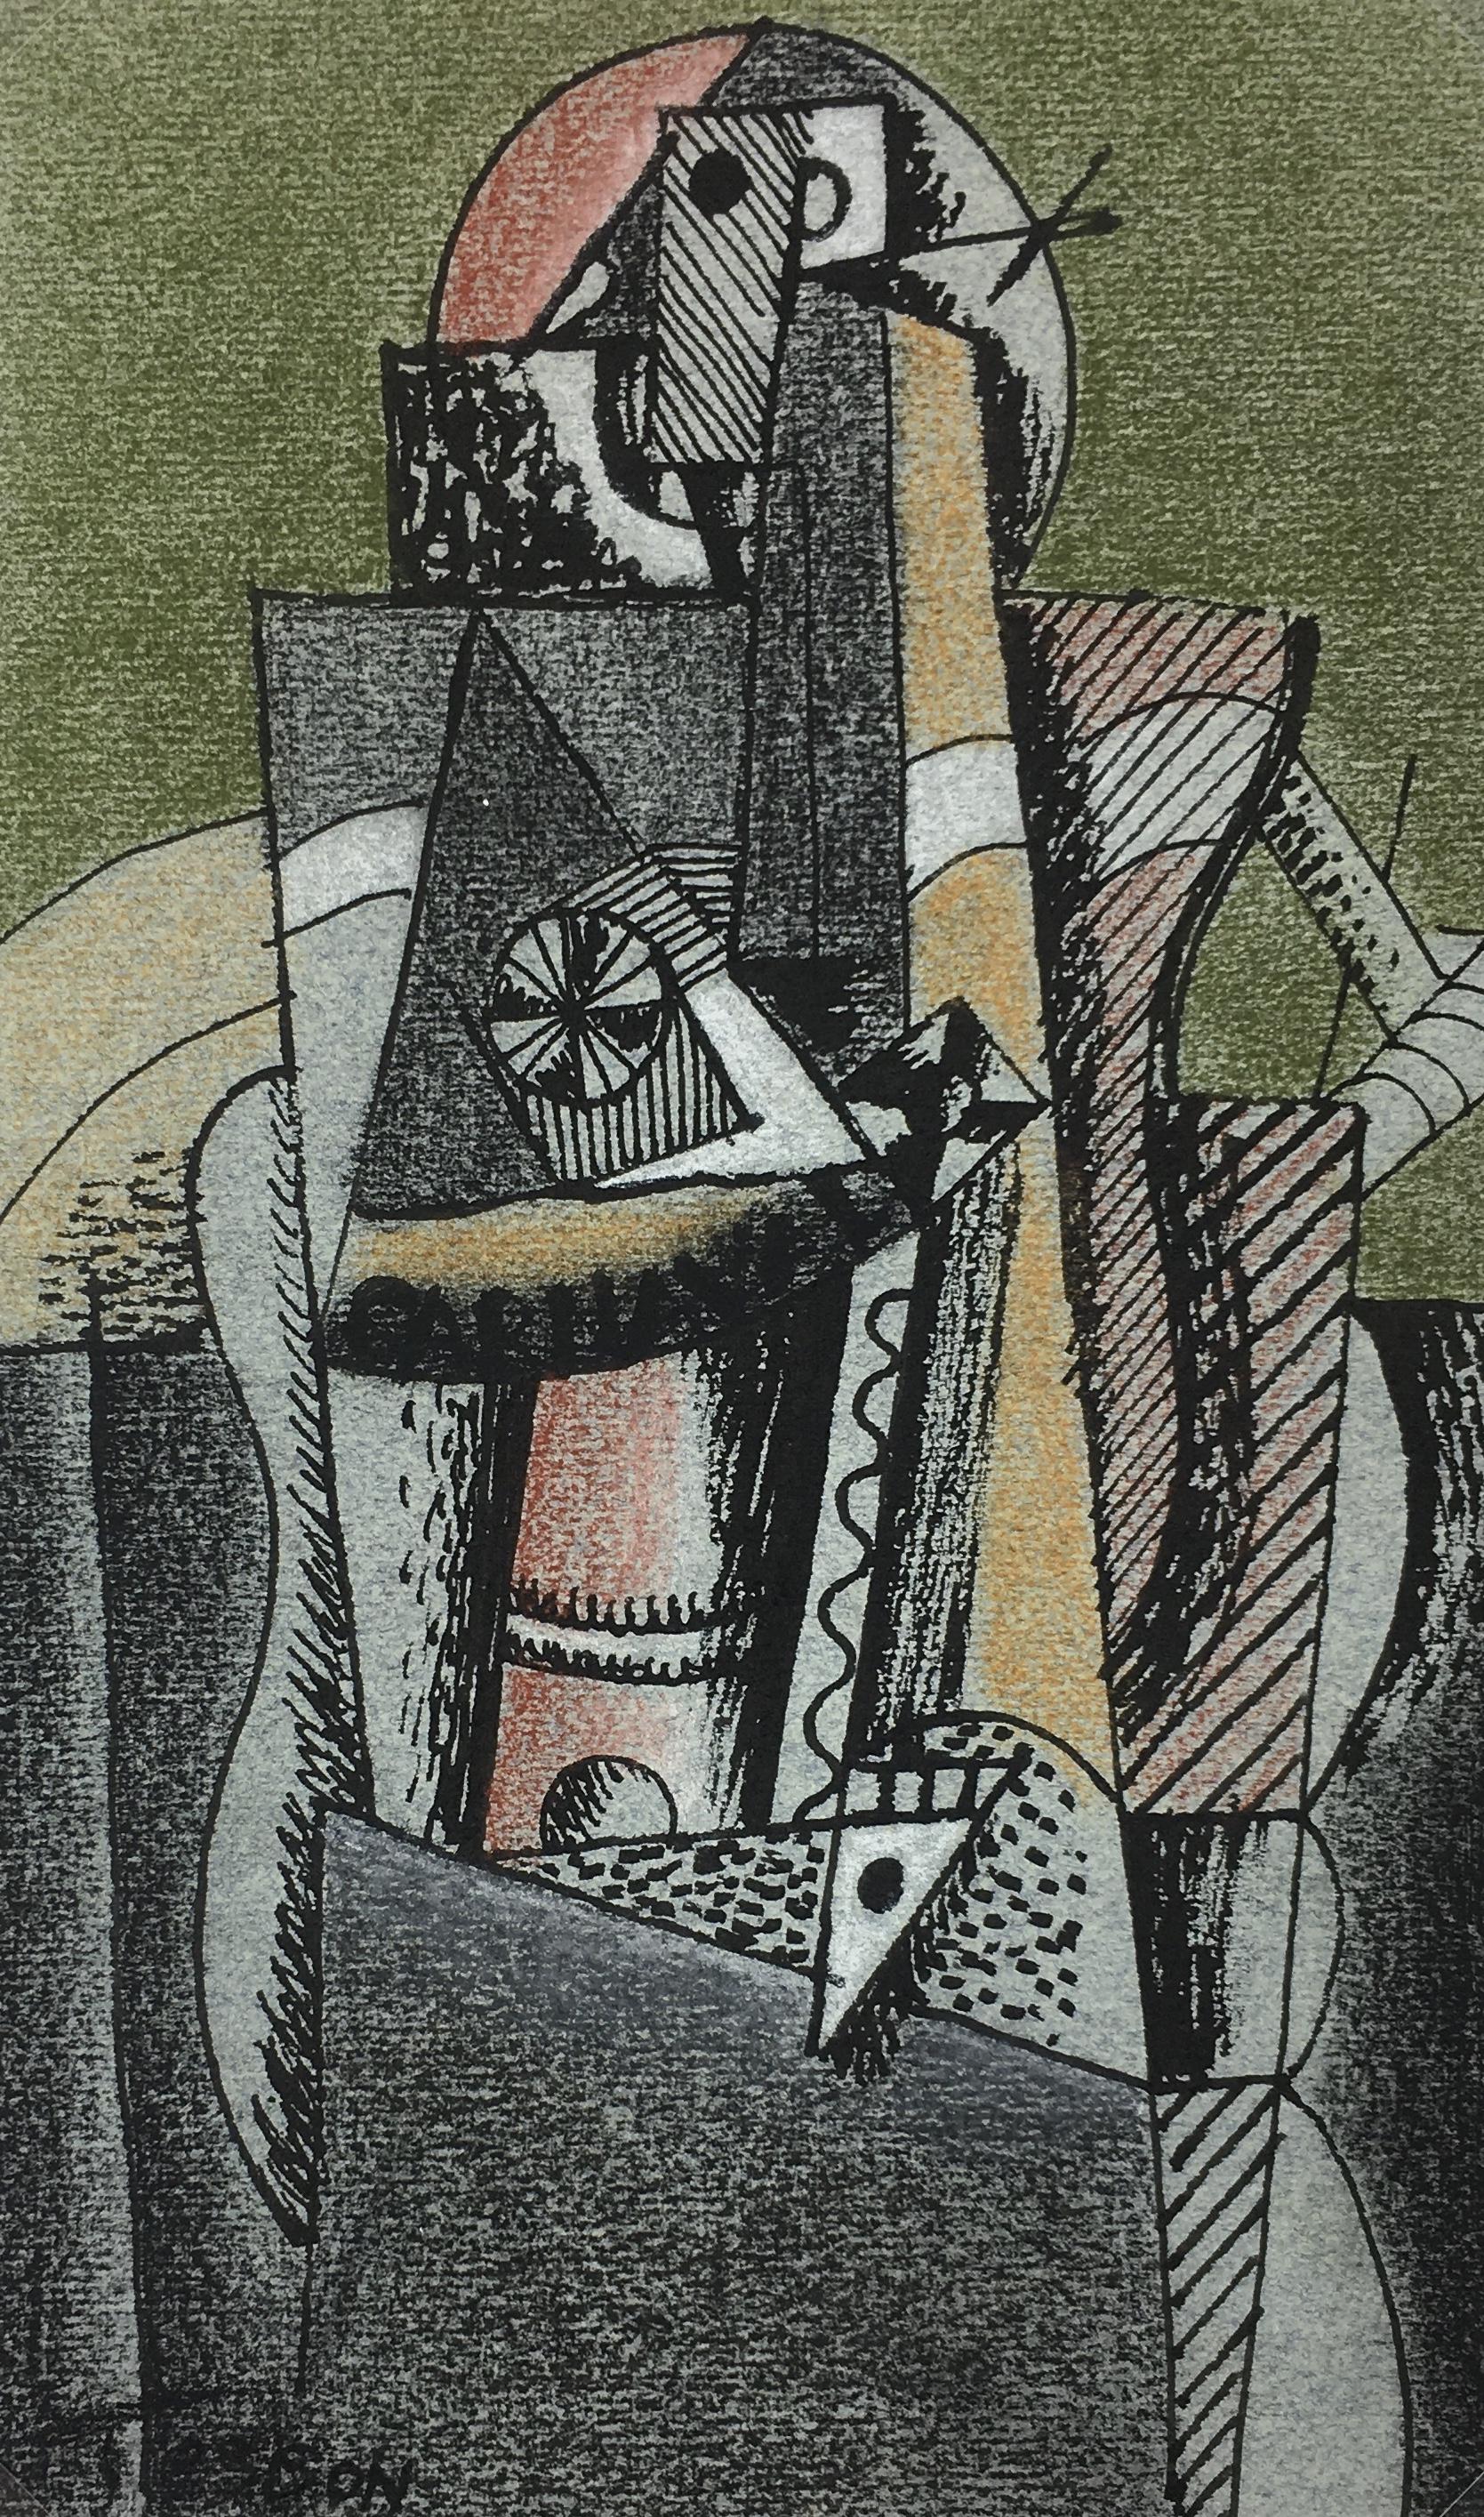 Surreal Modern Original Art - Abstract, Tesson, 1996